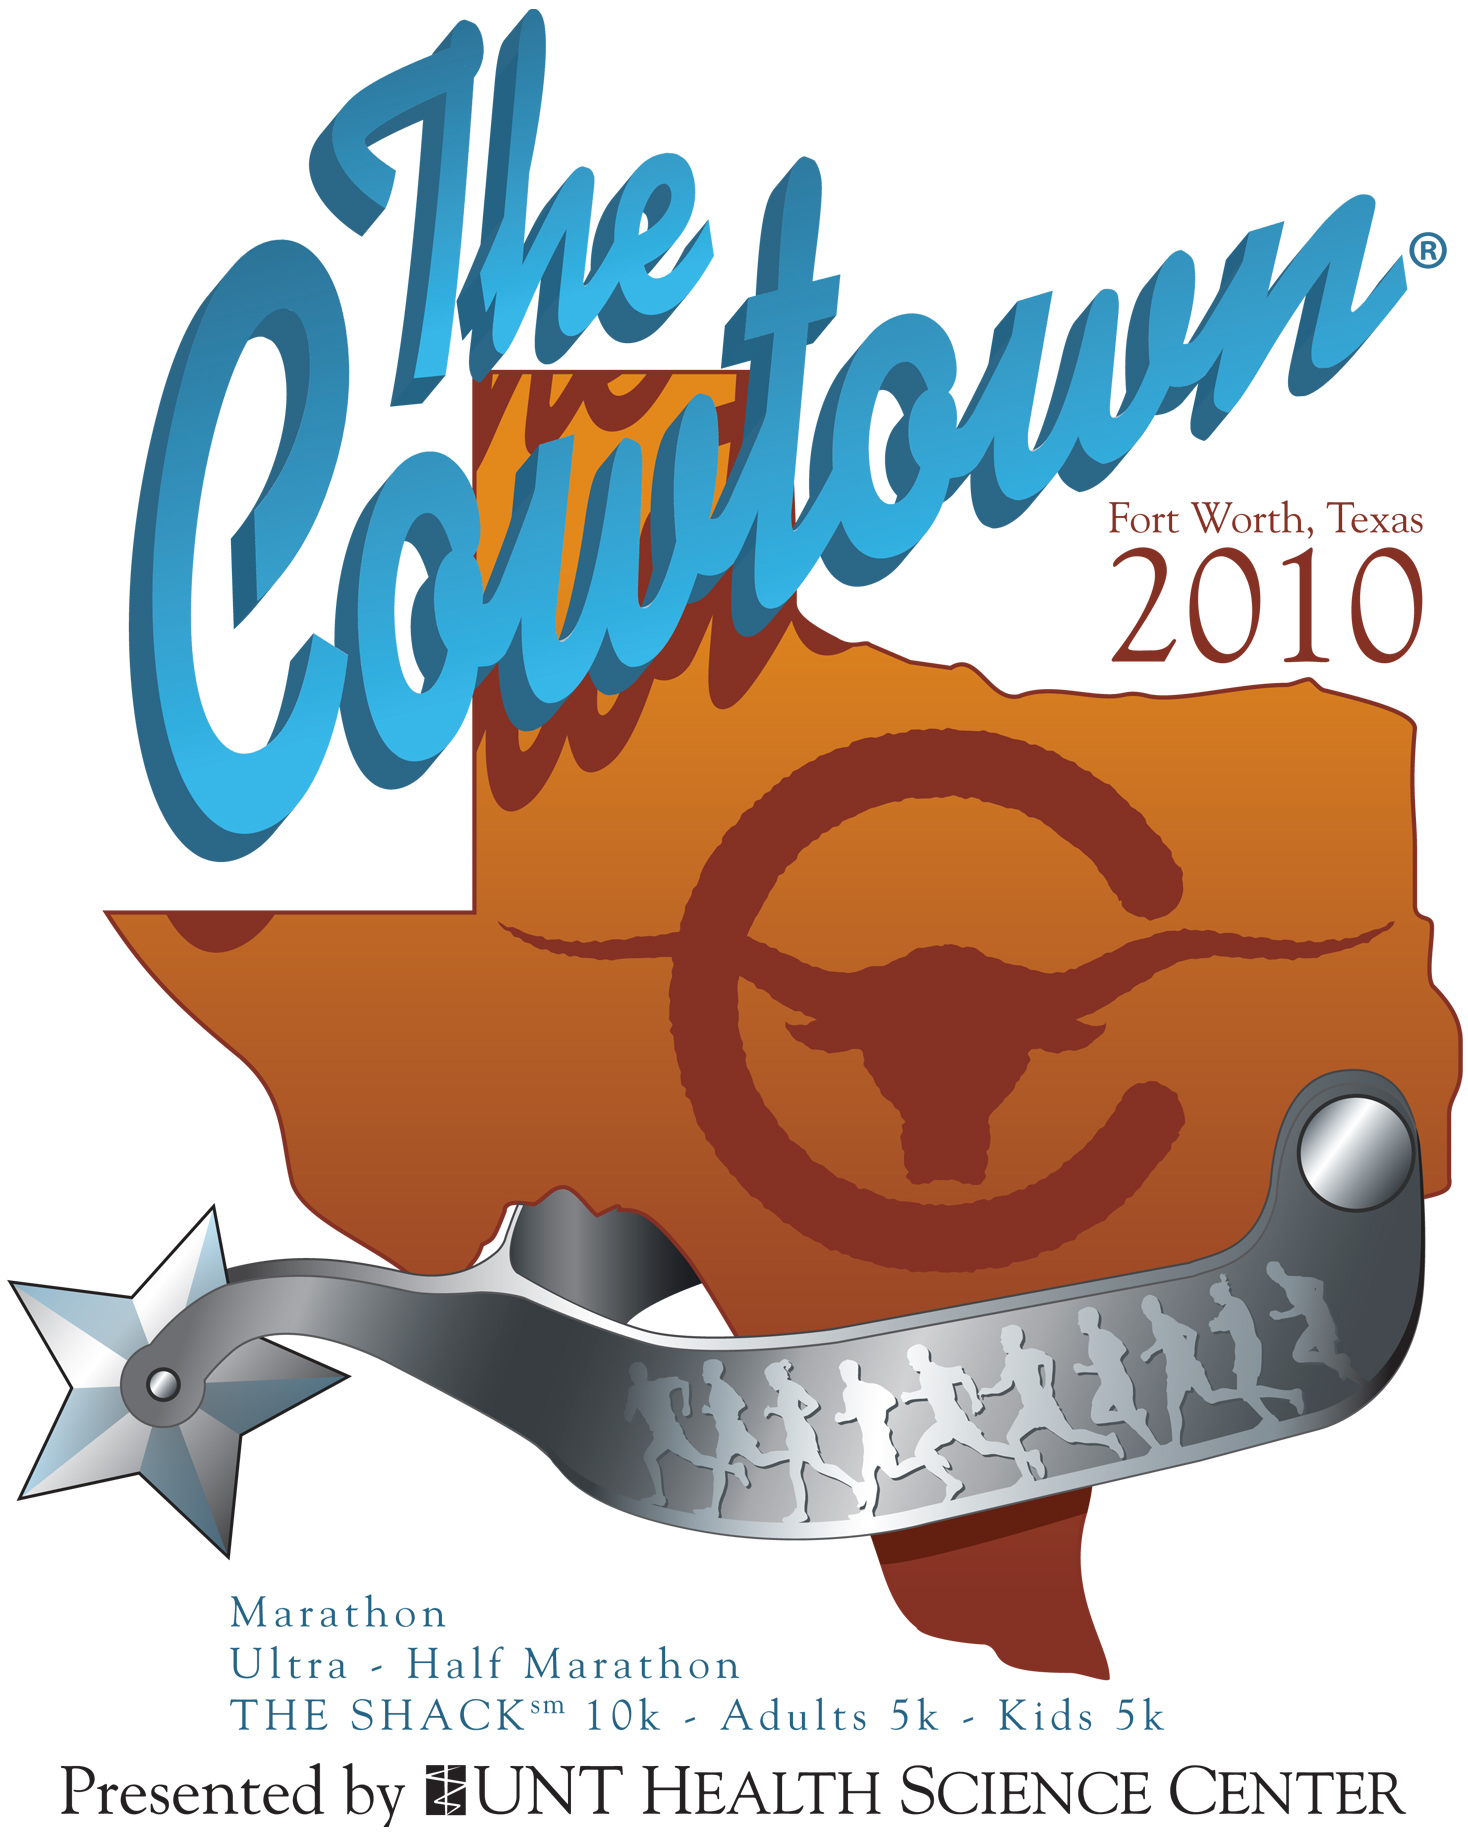 Cowtown Kids Run